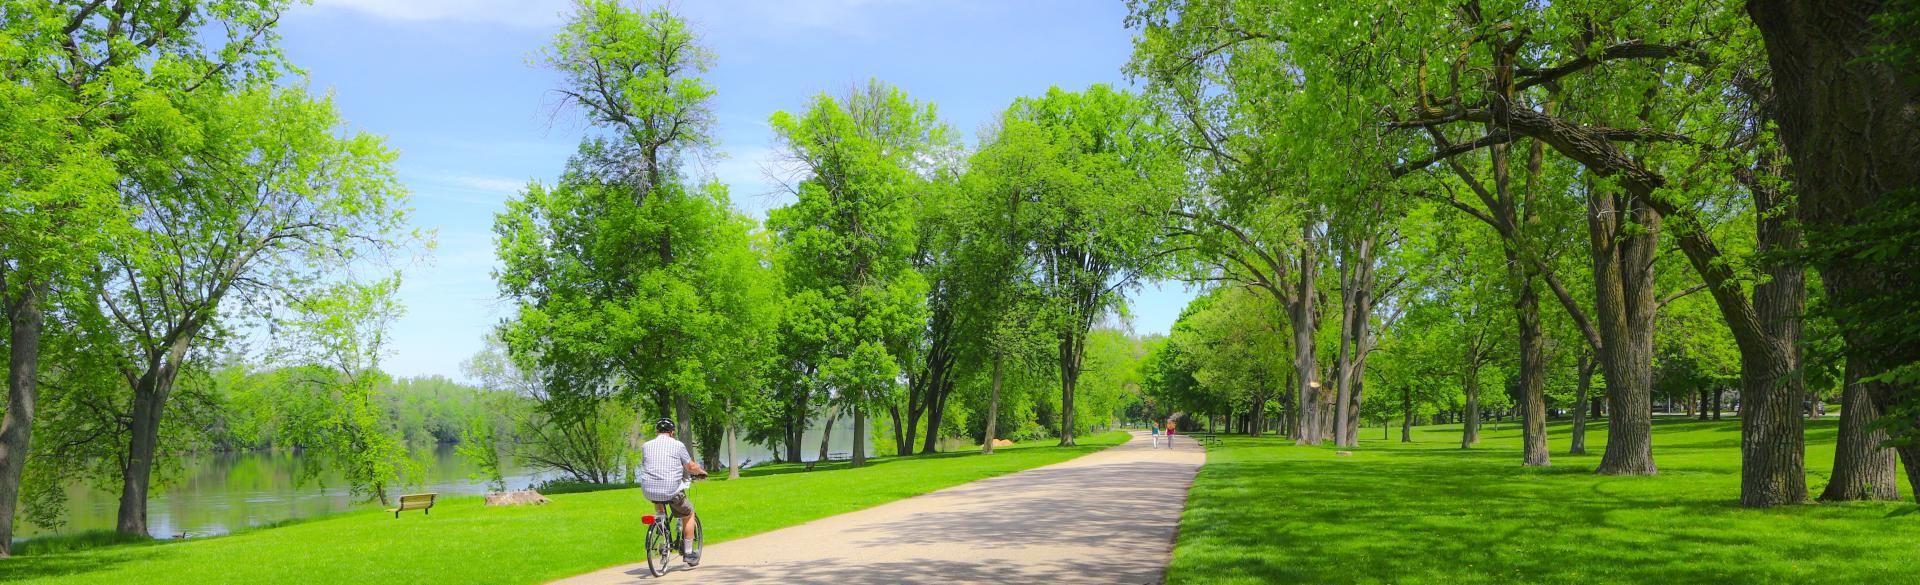 Copy of Biking in Riverside Park